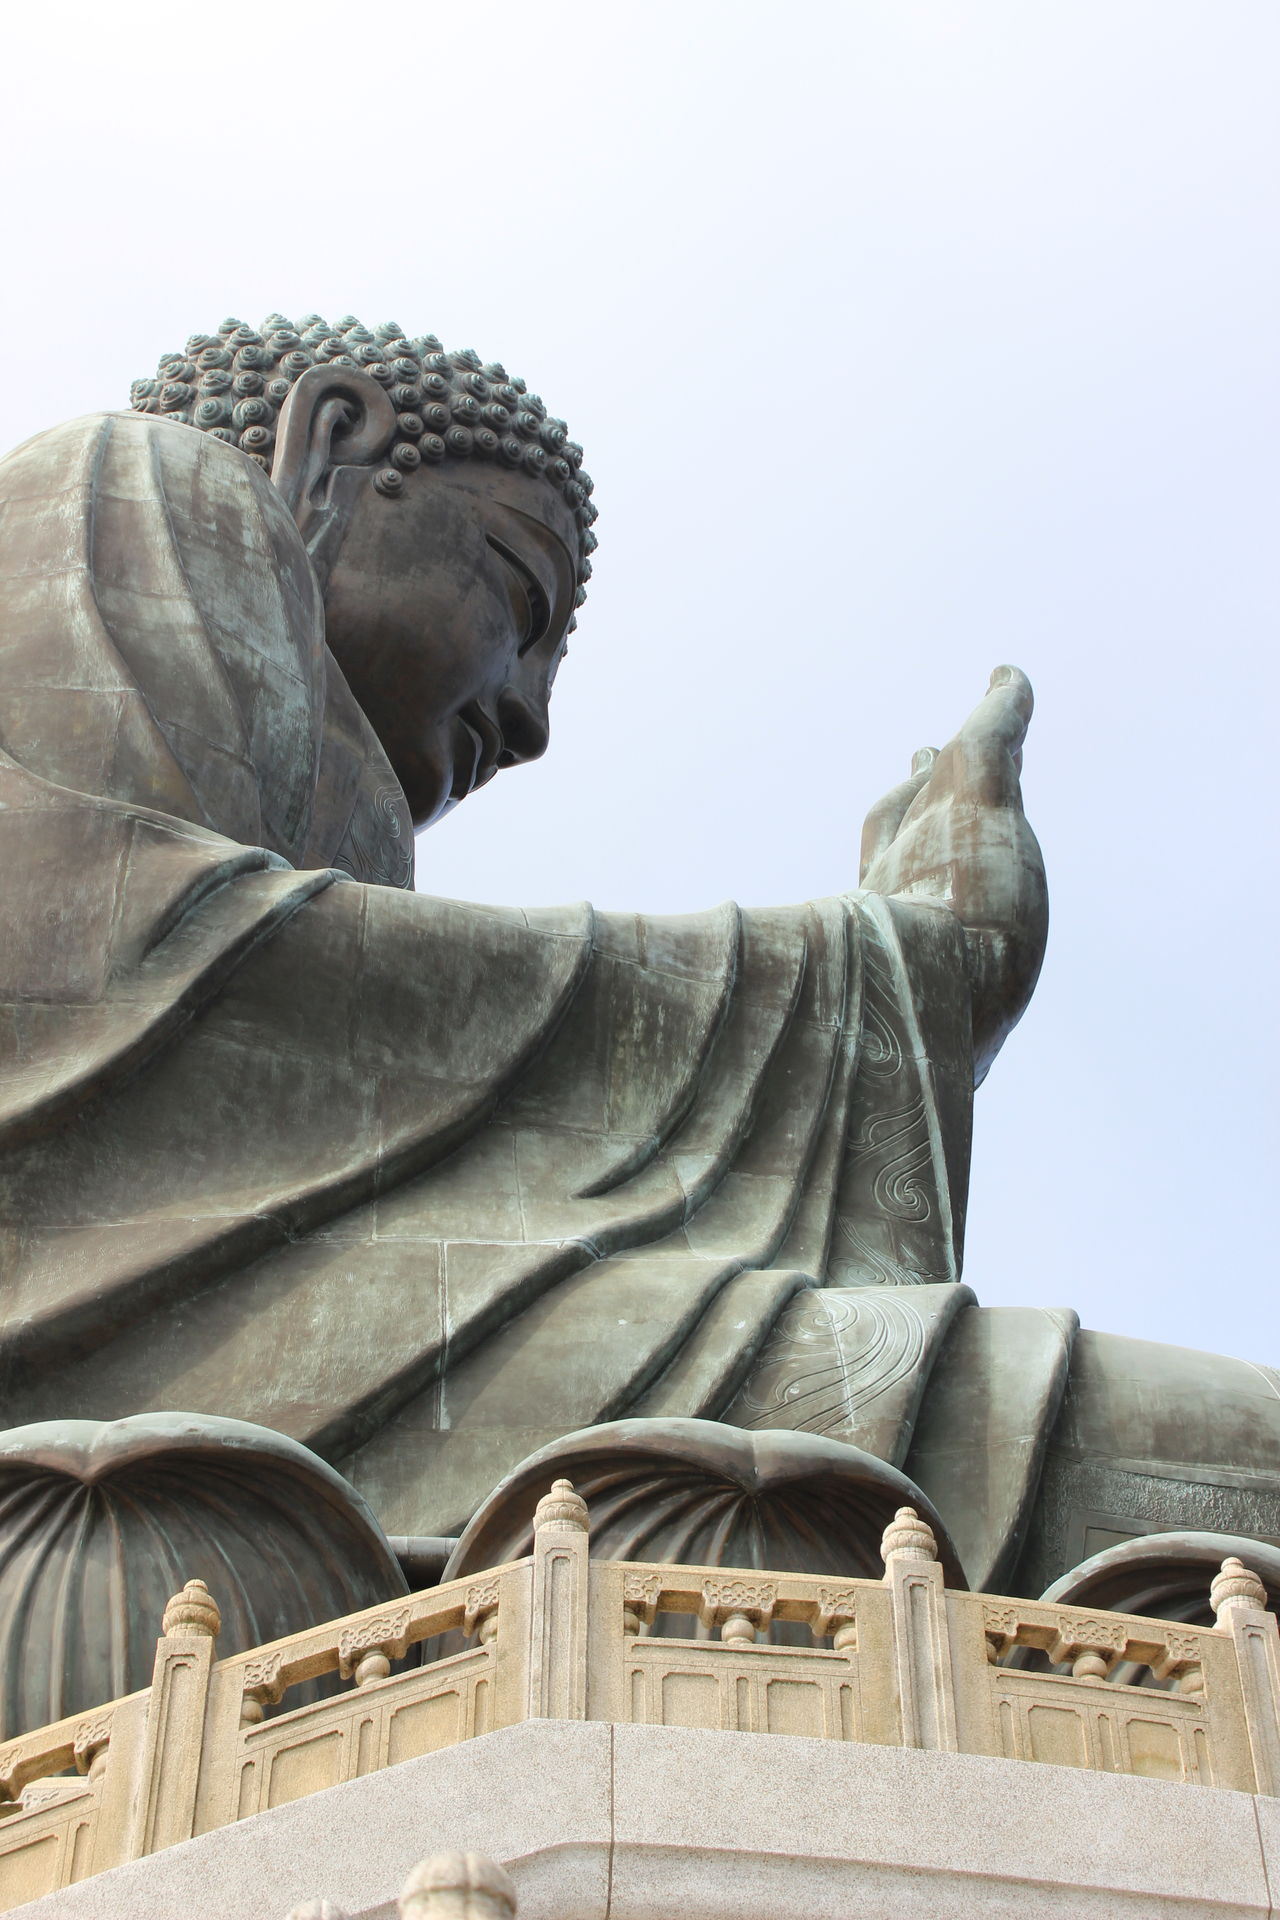 Statue Human Representation Sculpture Low Angle View Outdoors Sky No People Representing Day Tian Tan Buddha (Giant Buddha) 天壇大佛 HongKong Travel Photography Cloud - Sky Travel Destinations Mountain Statue